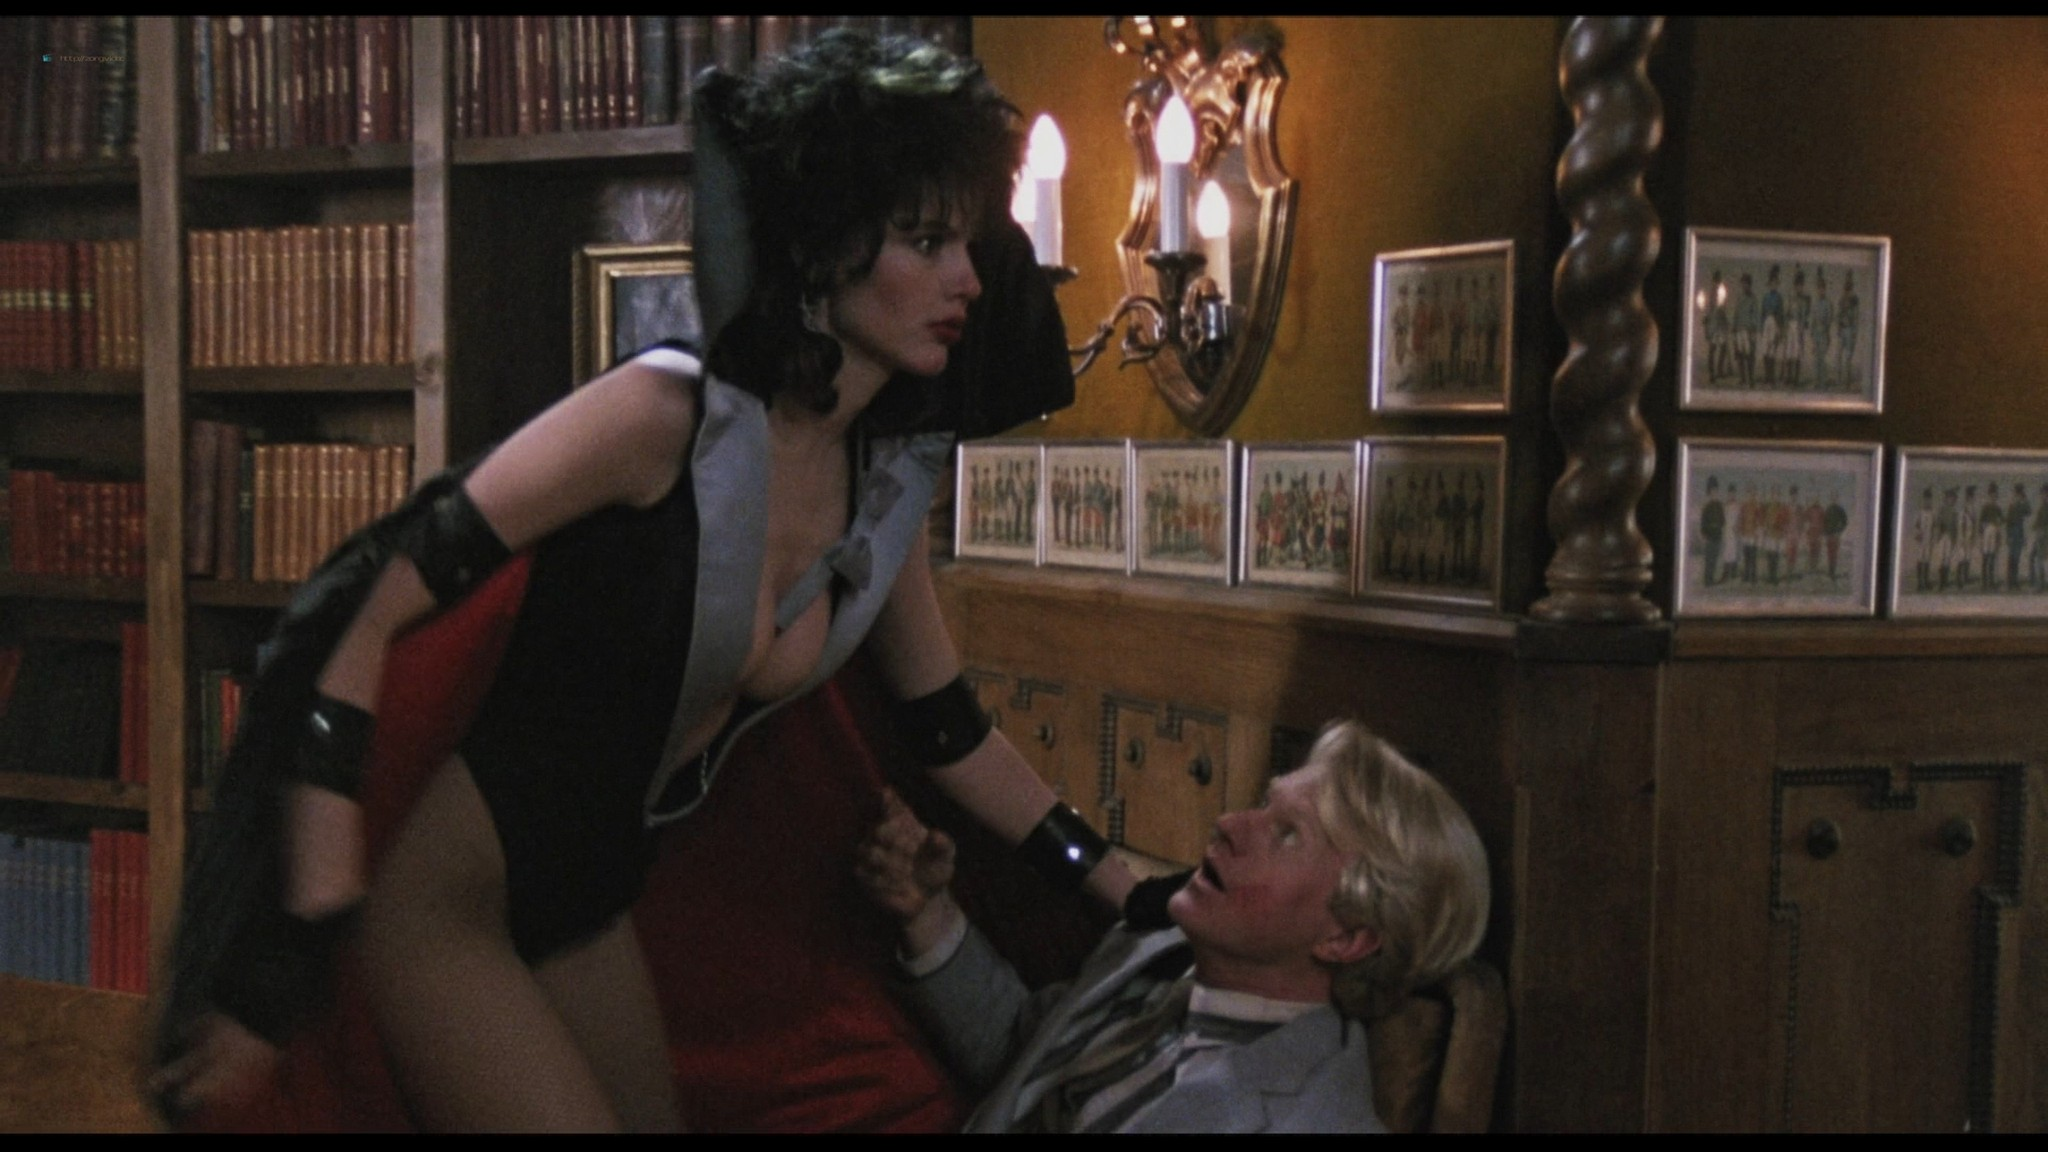 Geena Davis hot and sexy Ksenia Prohaska sexy - Transylvania 6-5000 (1985) HD 1080p BluRay (12)